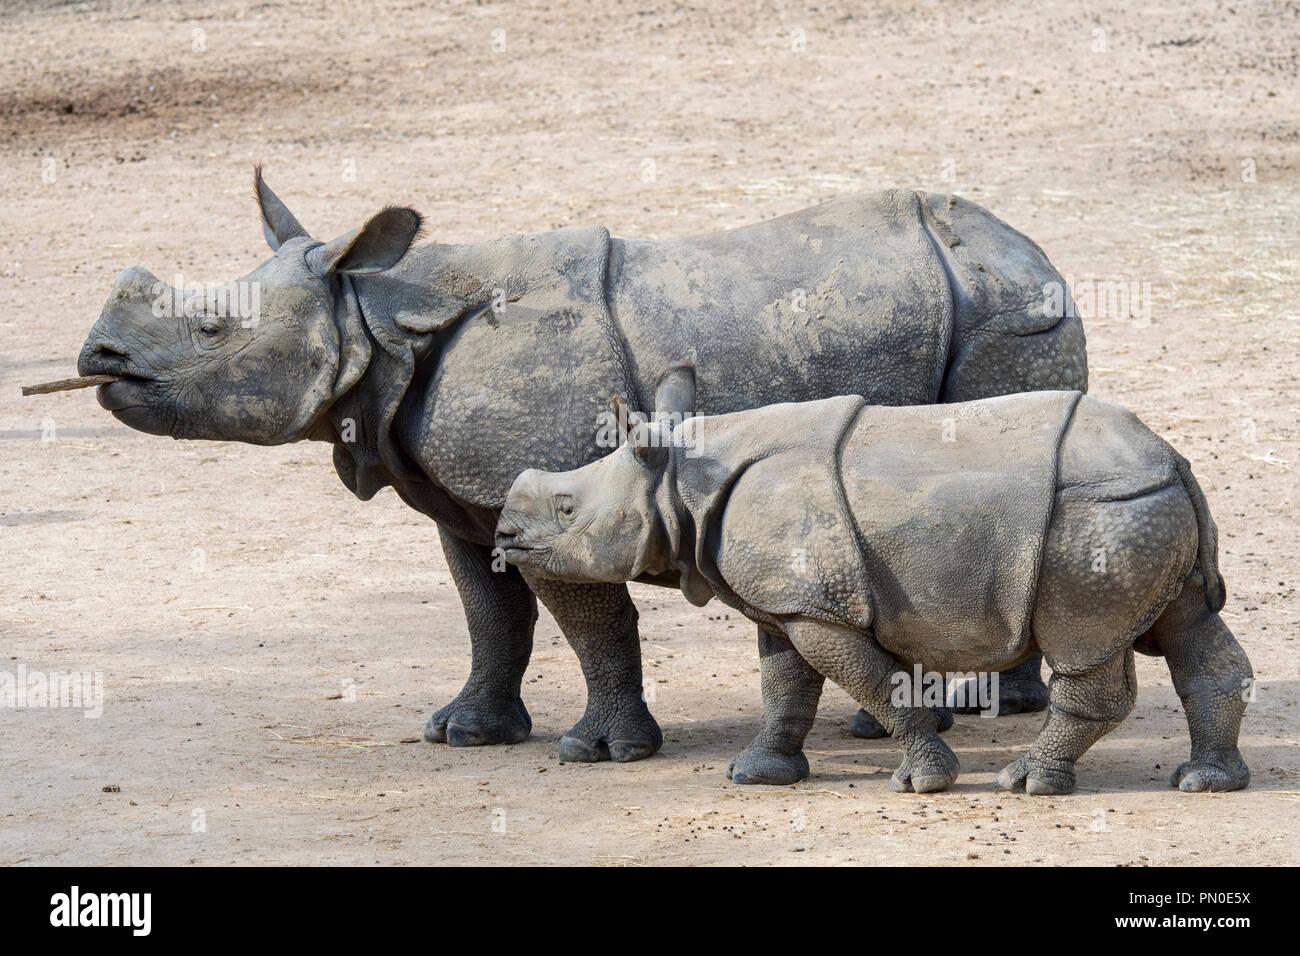 Indian rhinoceros (Rhinoceros unicornis) female with young in zoo - Stock Image